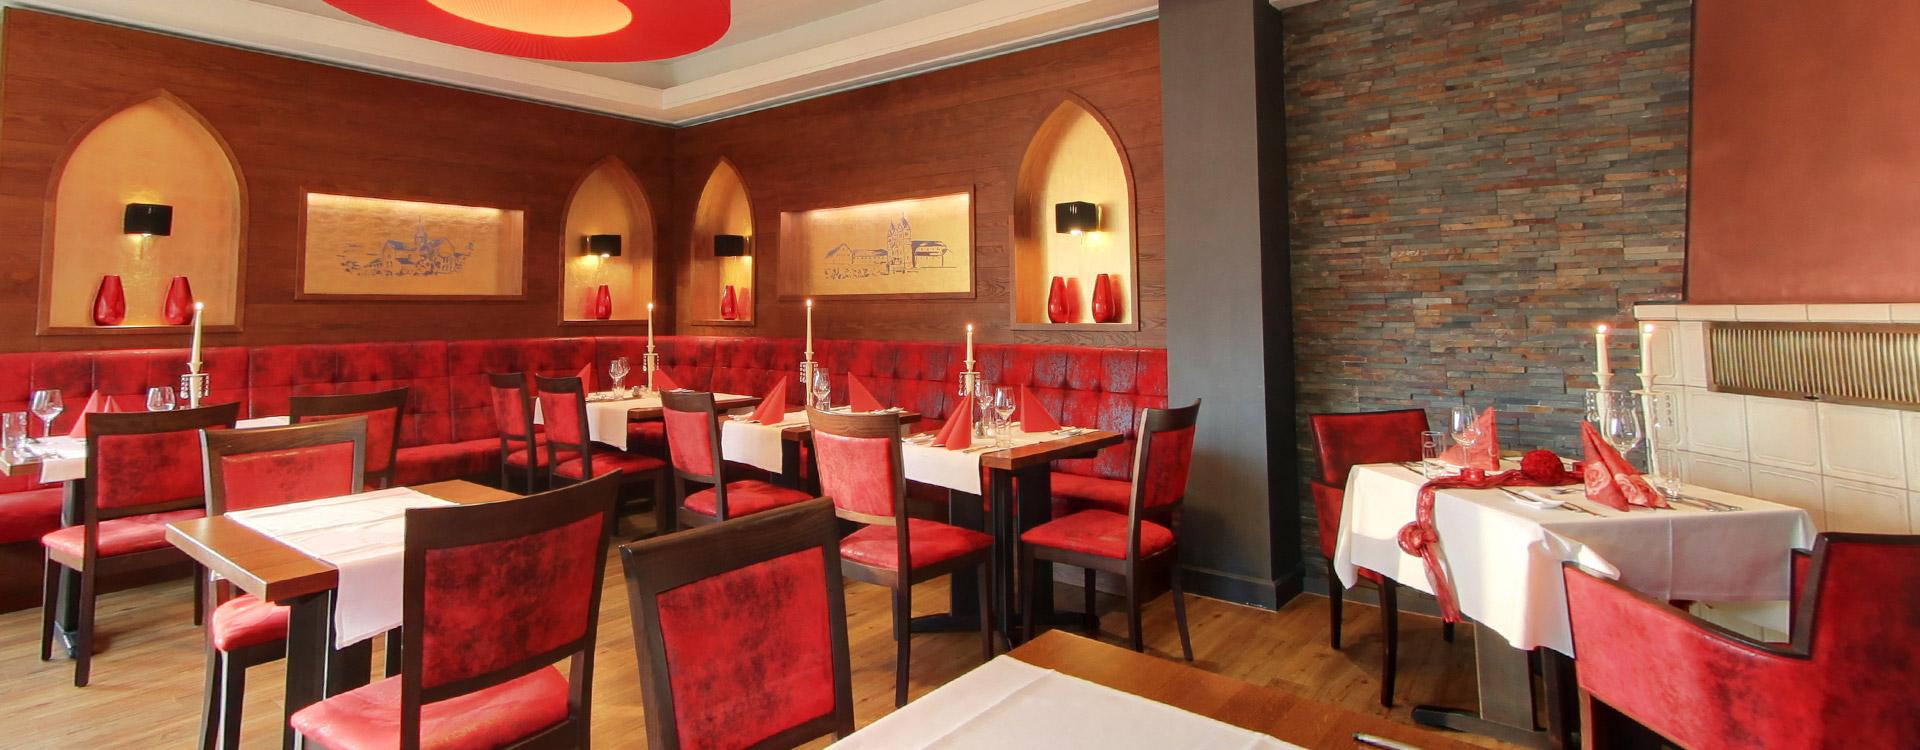 akzent_waldhotel_rheingau_geisenheim_restaurant_01